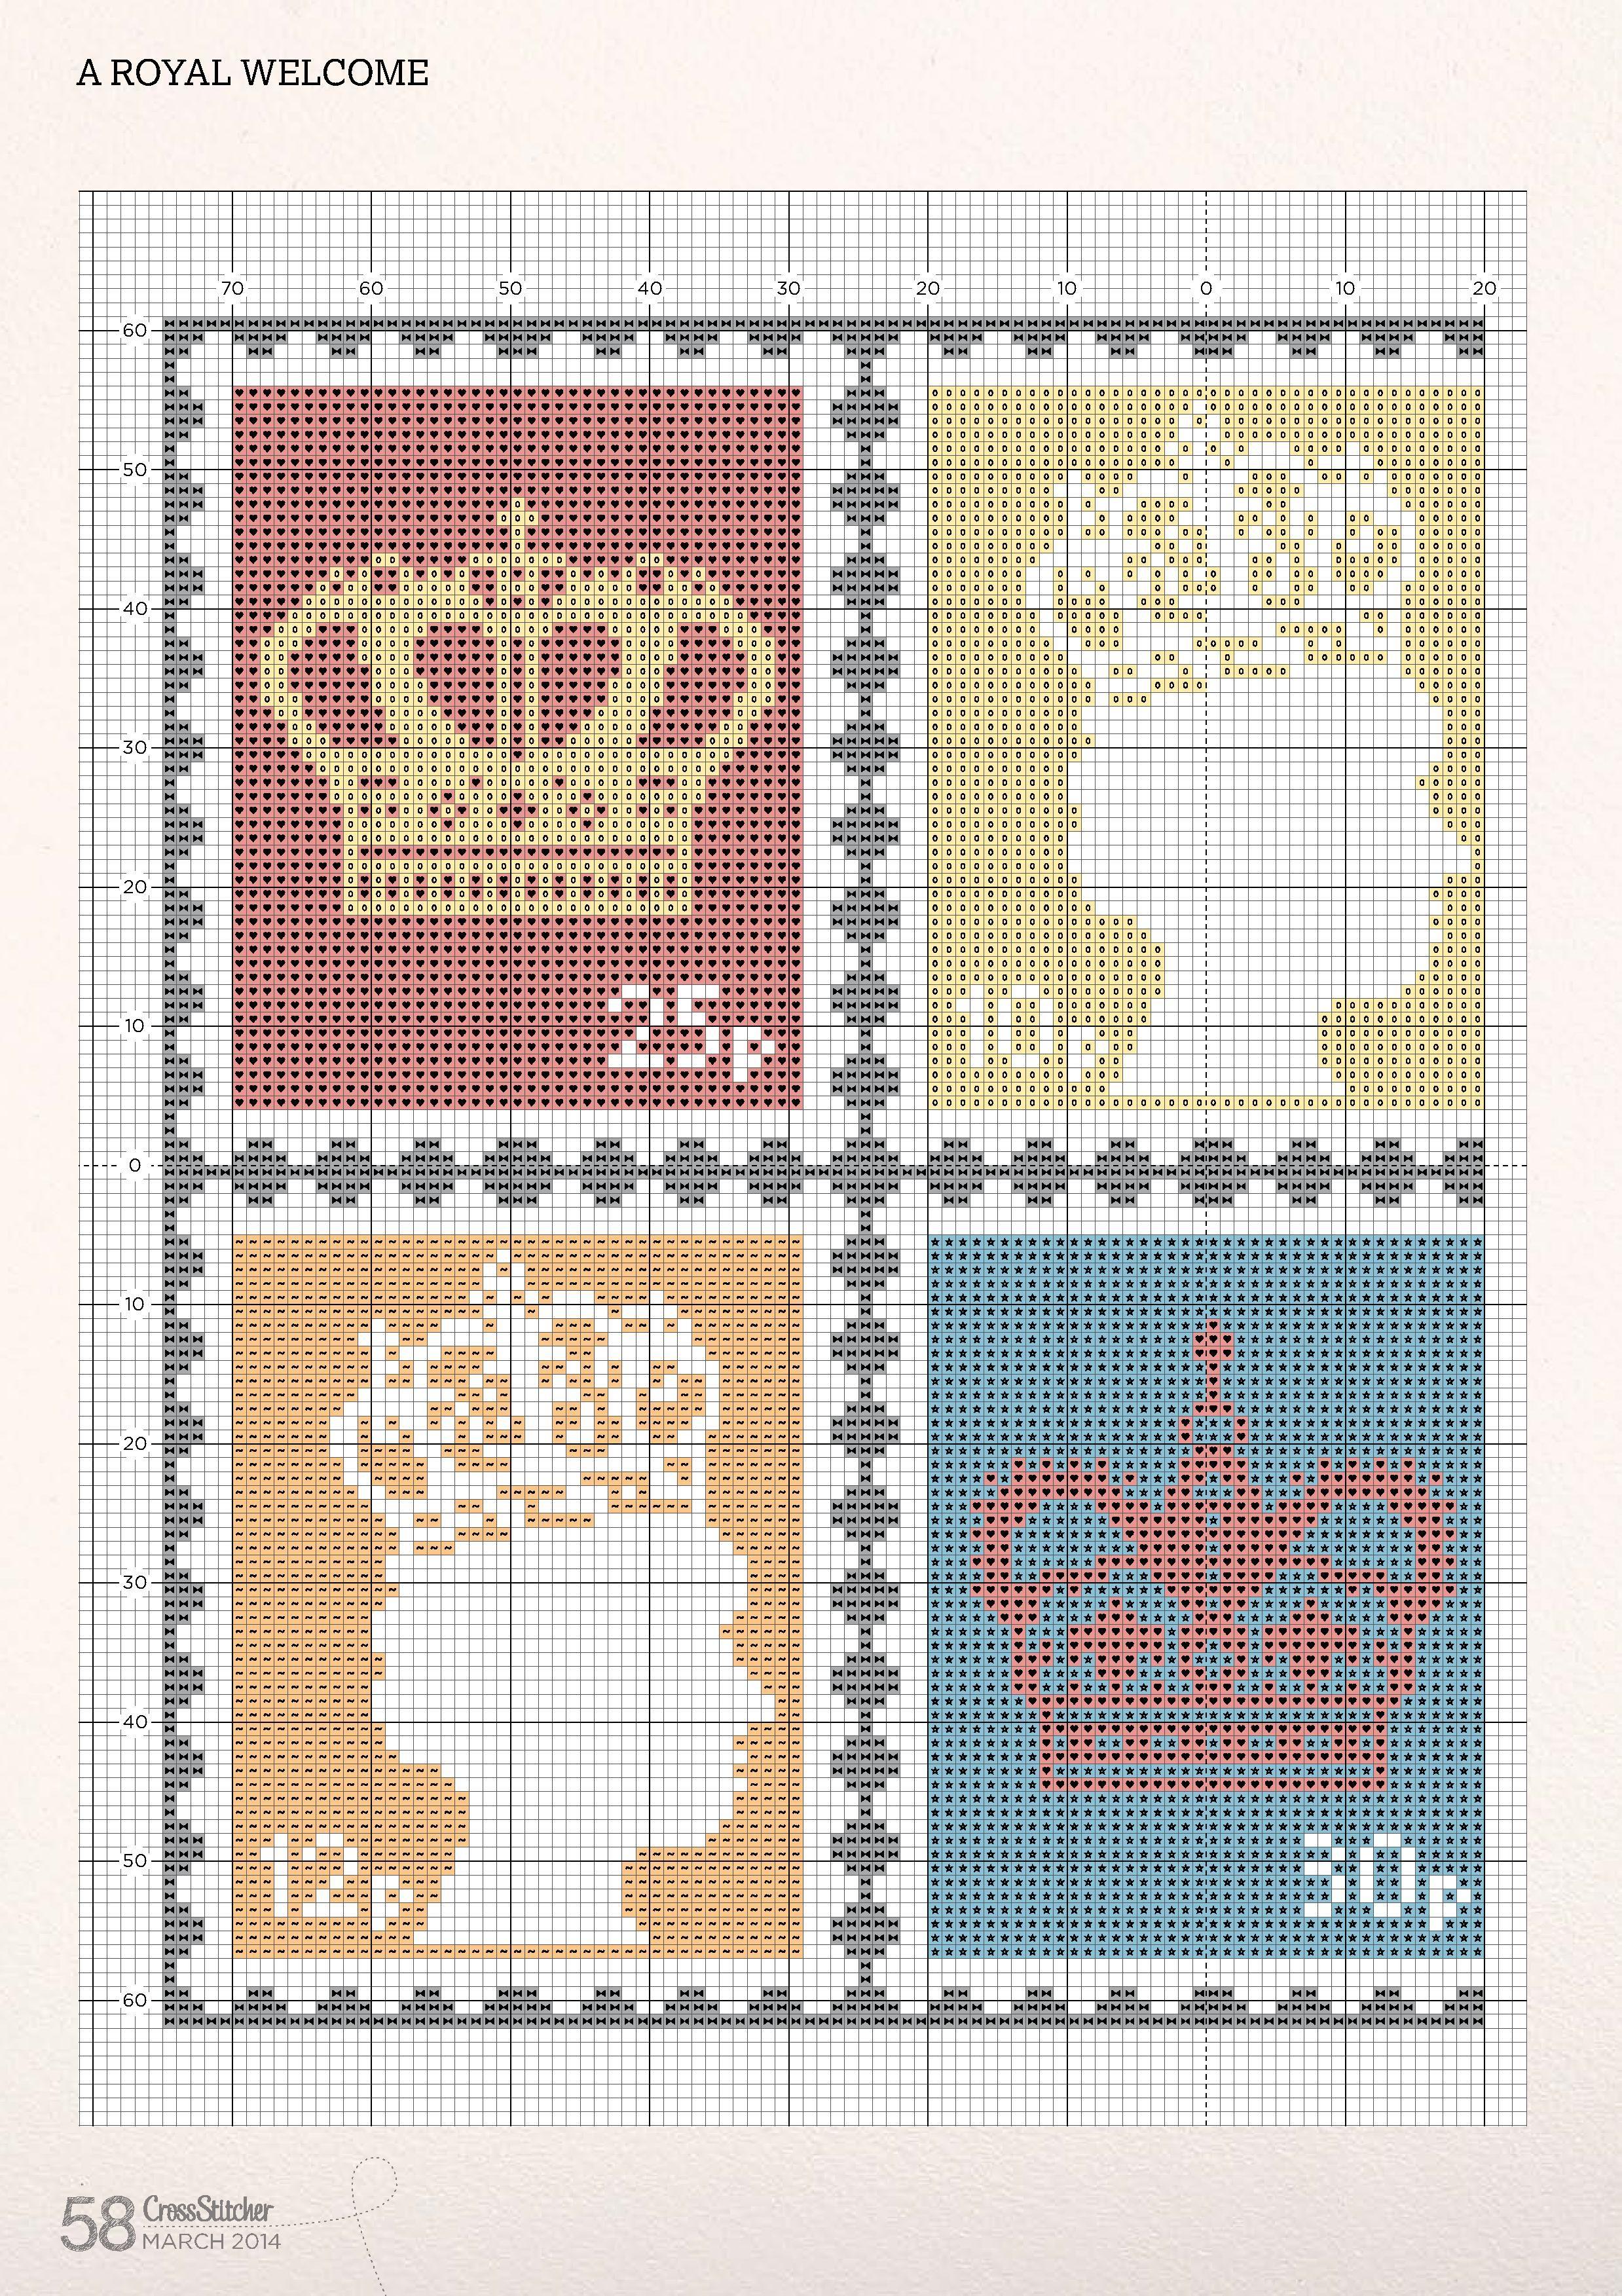 Queen Elizabeth Postage Stamps